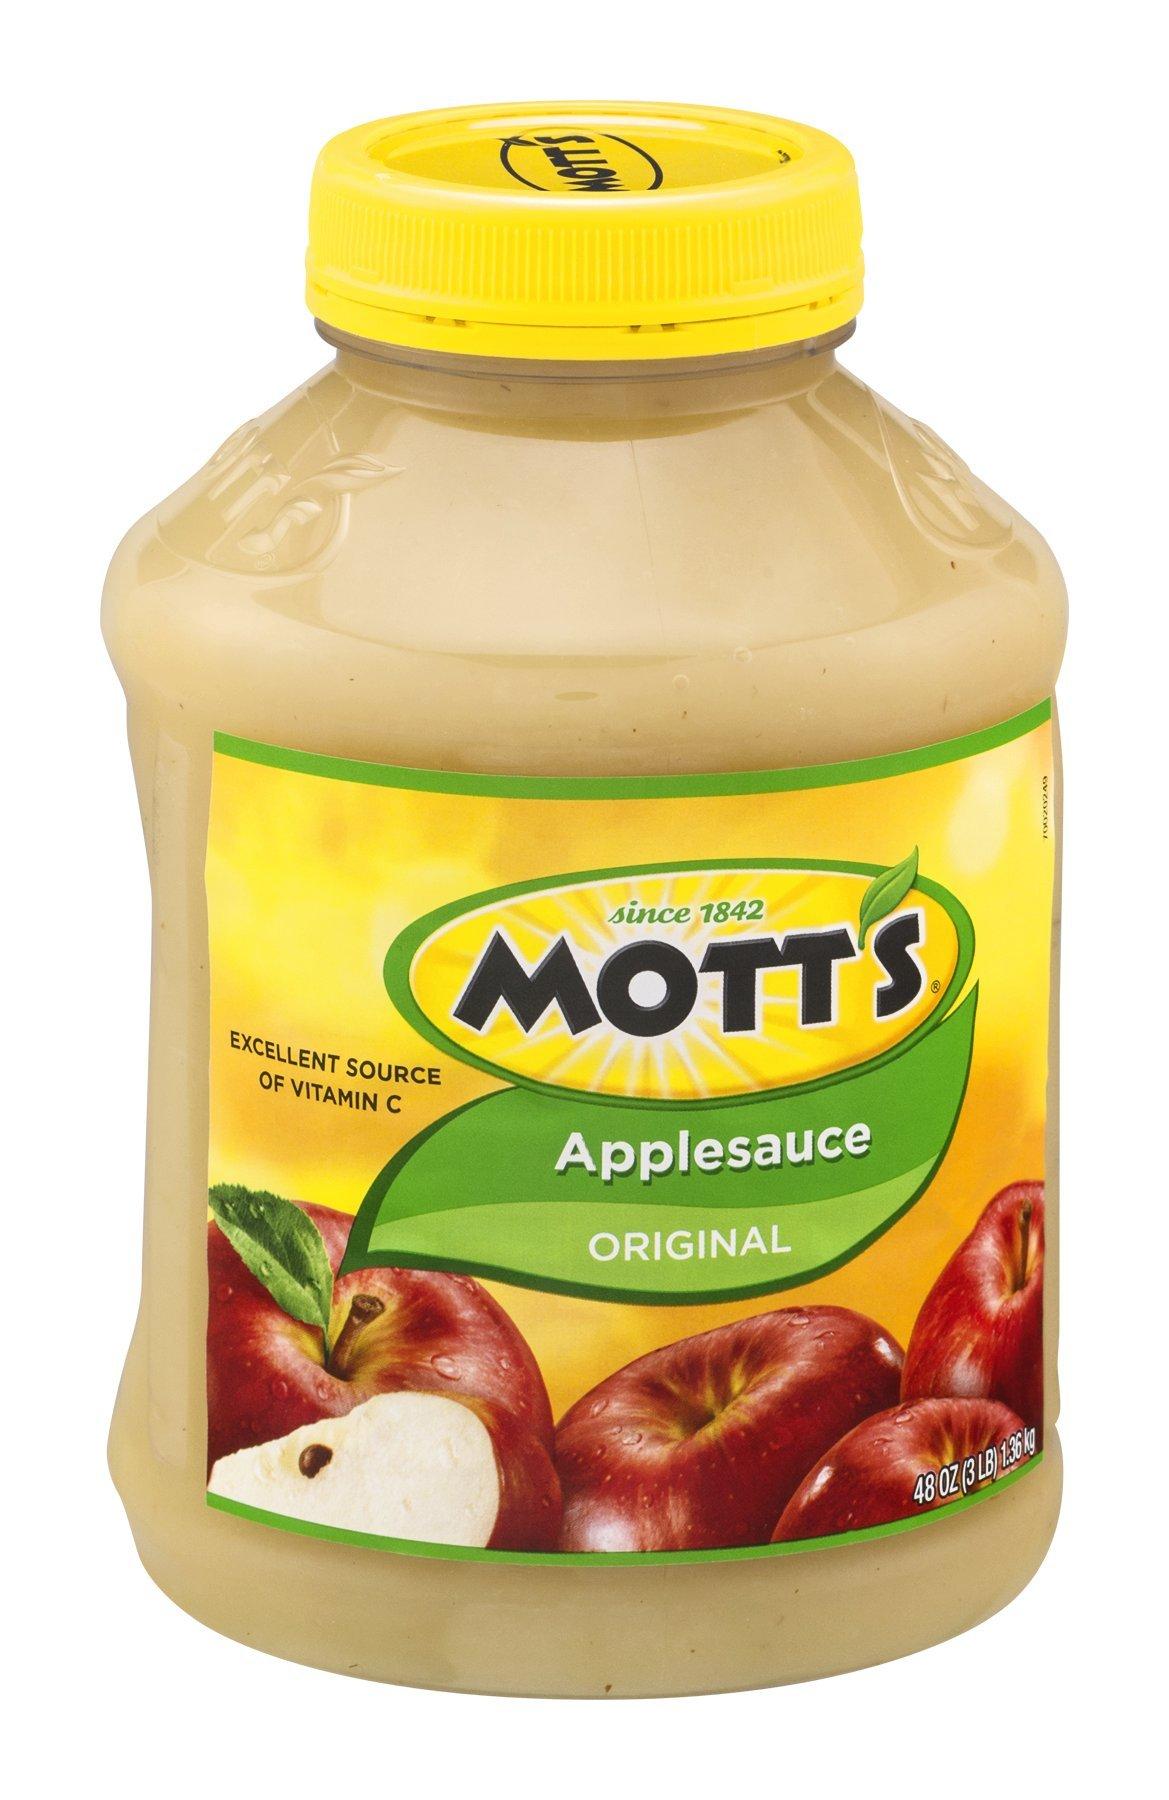 Mott's Applesauce Original 48 OZ (Pack of 8)